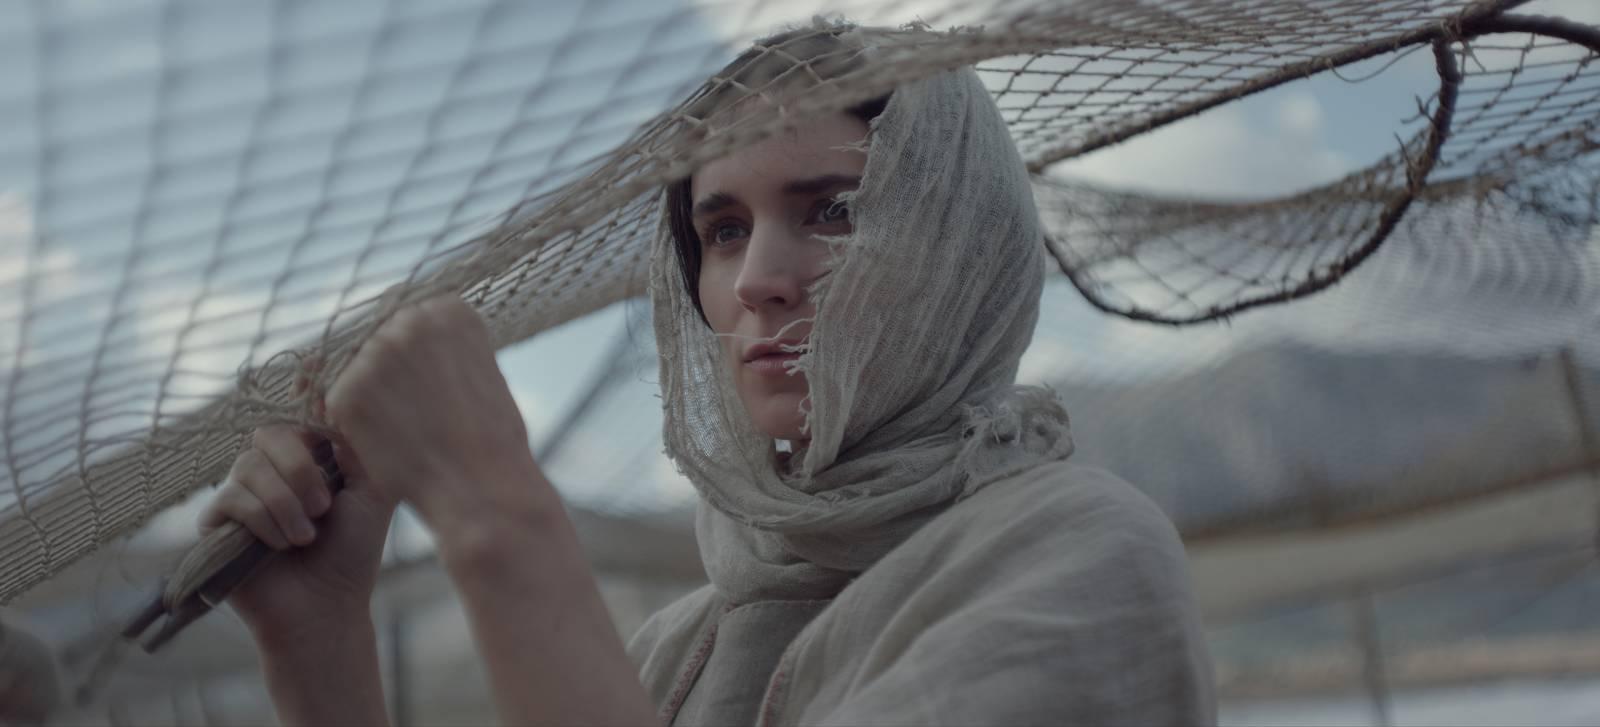 Film Mária Magdaléna (2018)